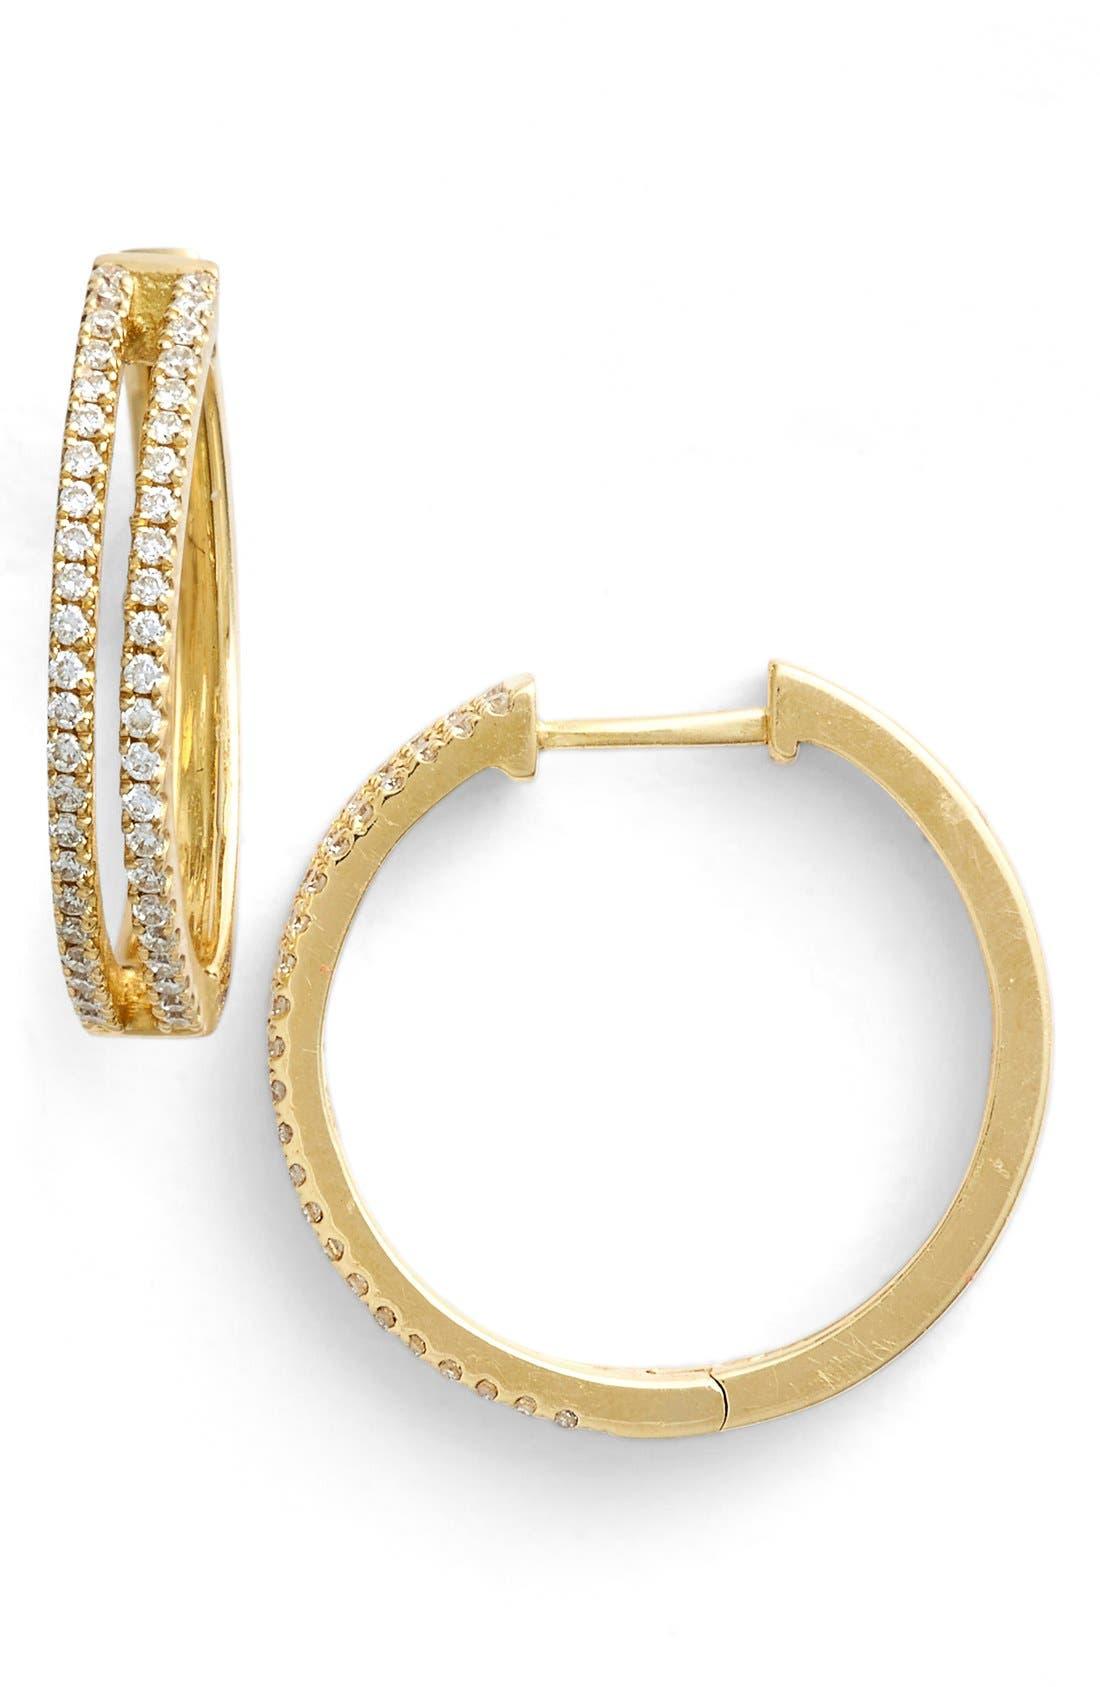 Main Image - Bony Levy Diamond Split Hoop Earrings (Limited Edition) (Nordstrom Exclusive)